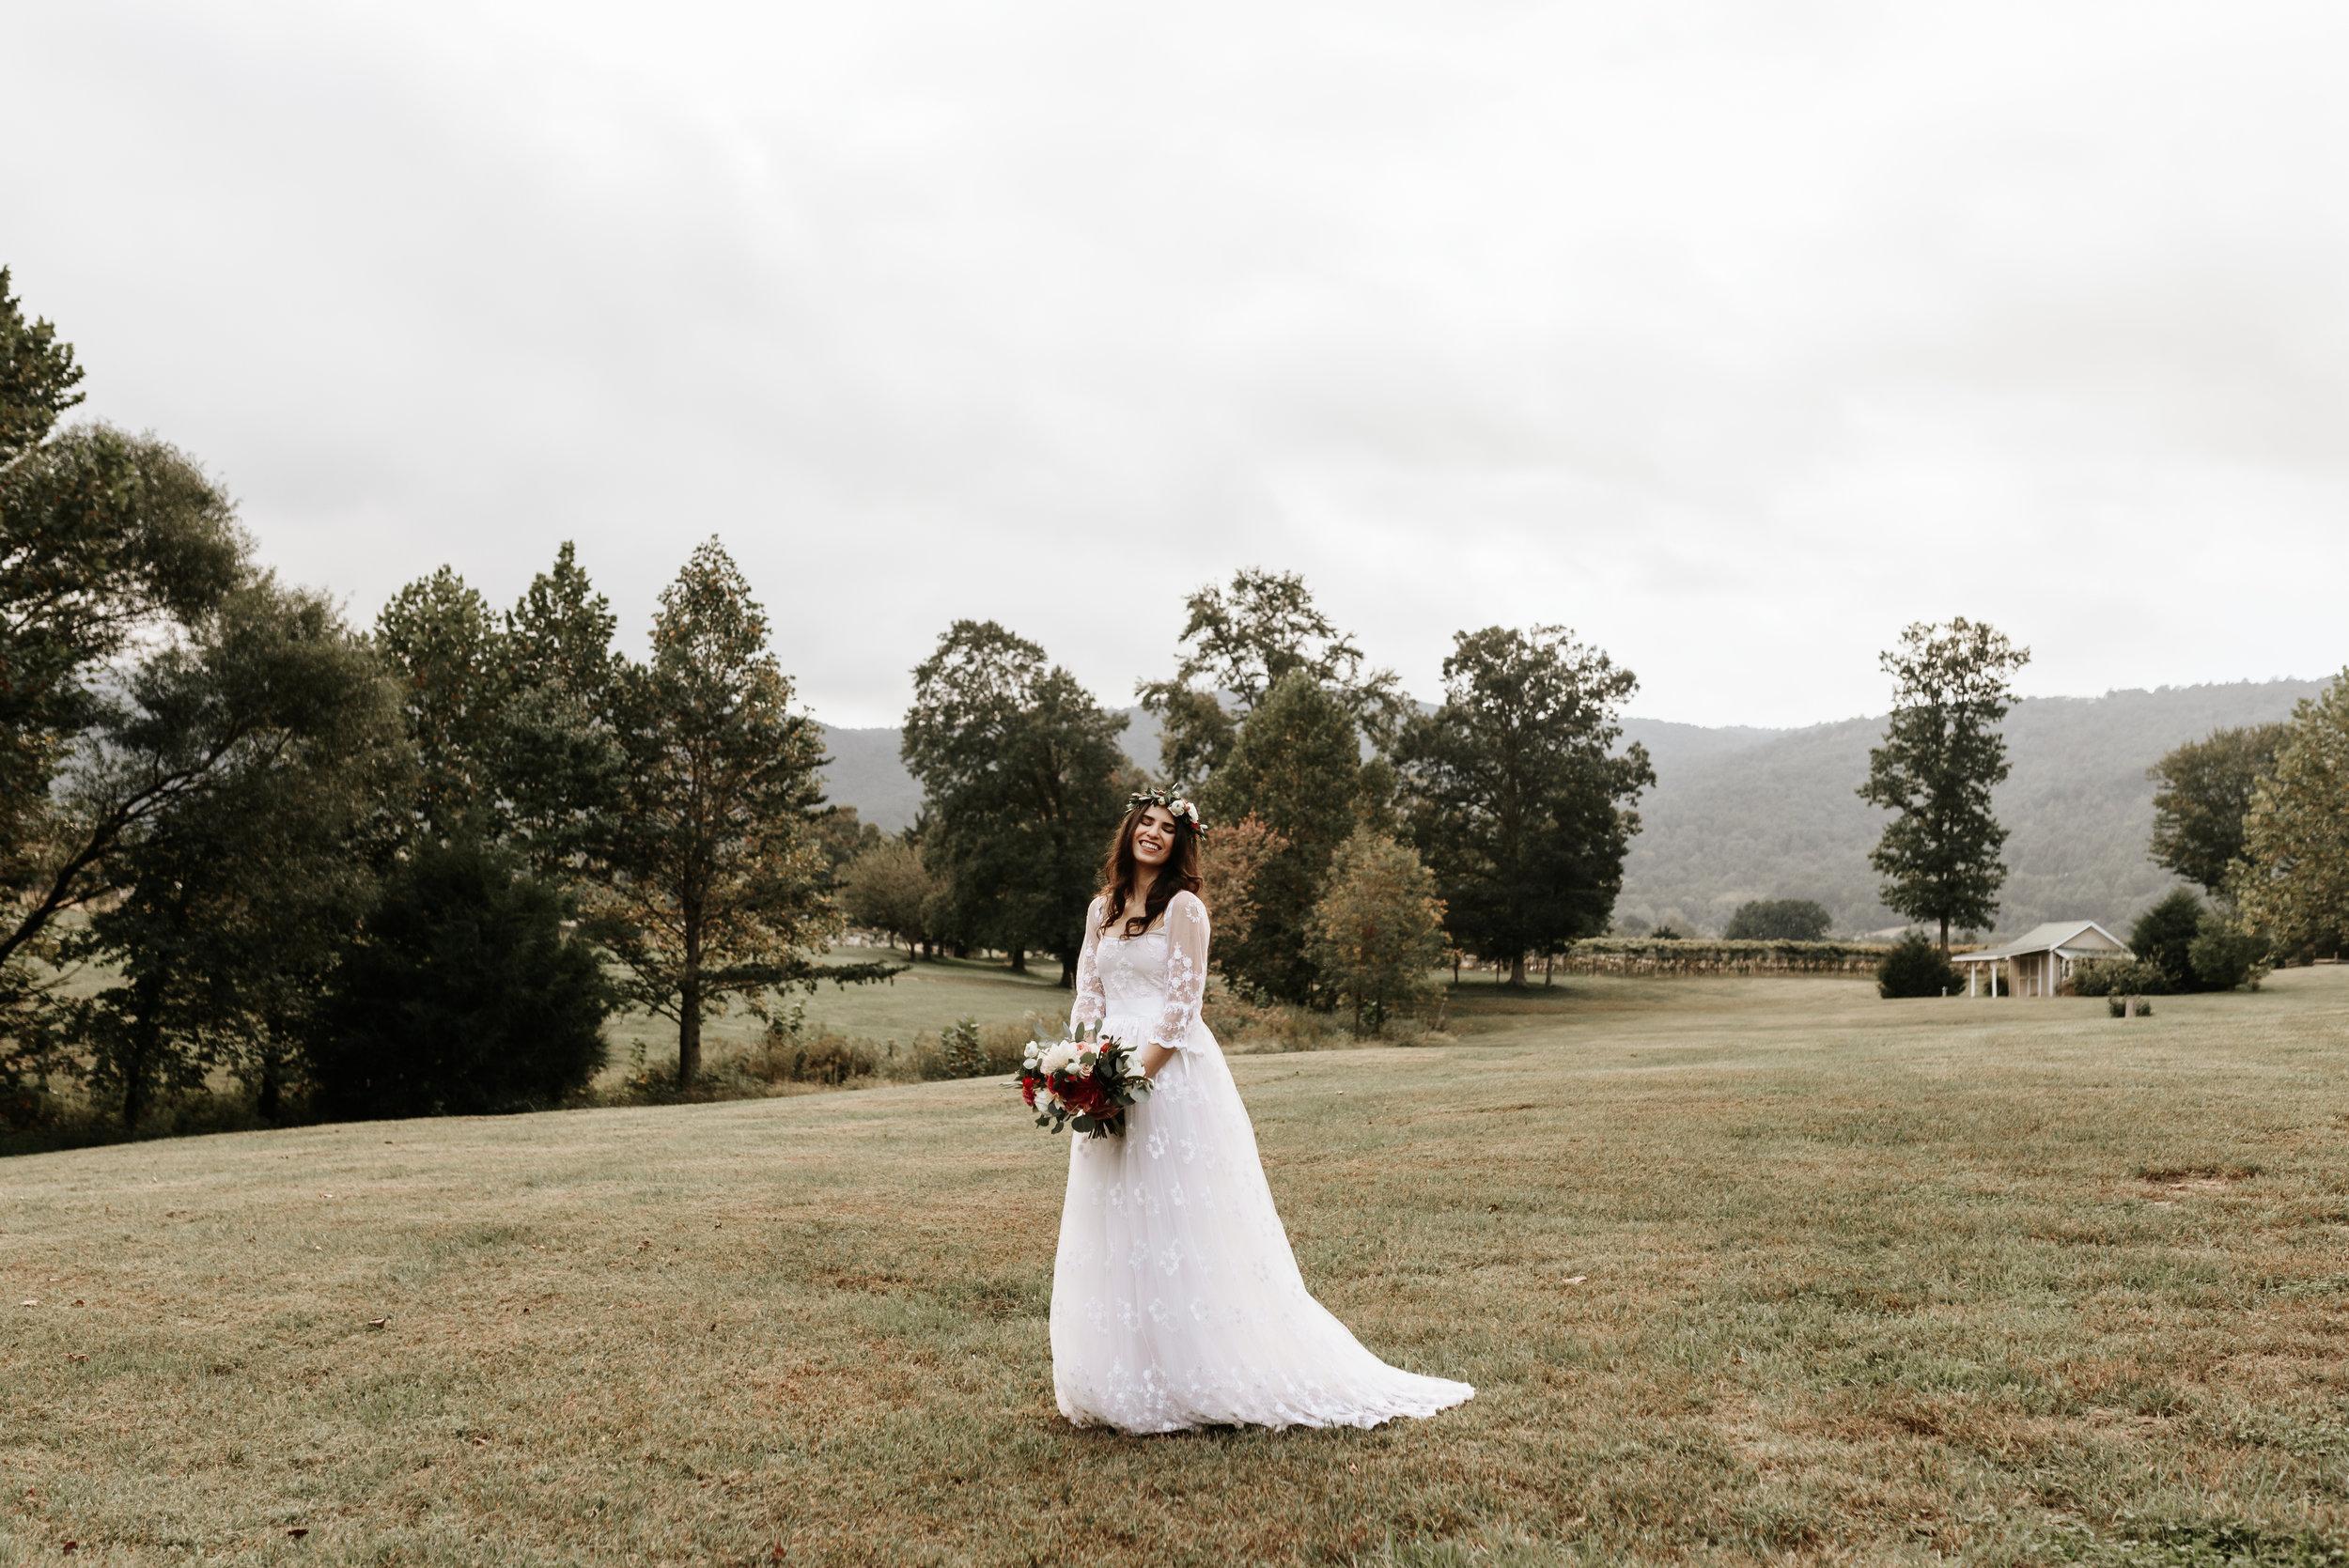 Veritas-Vineyards-and-Winery-Wedding-Photography-Afton-Virginia-Yasmin-Seth-Photography-by-V-9429.jpg